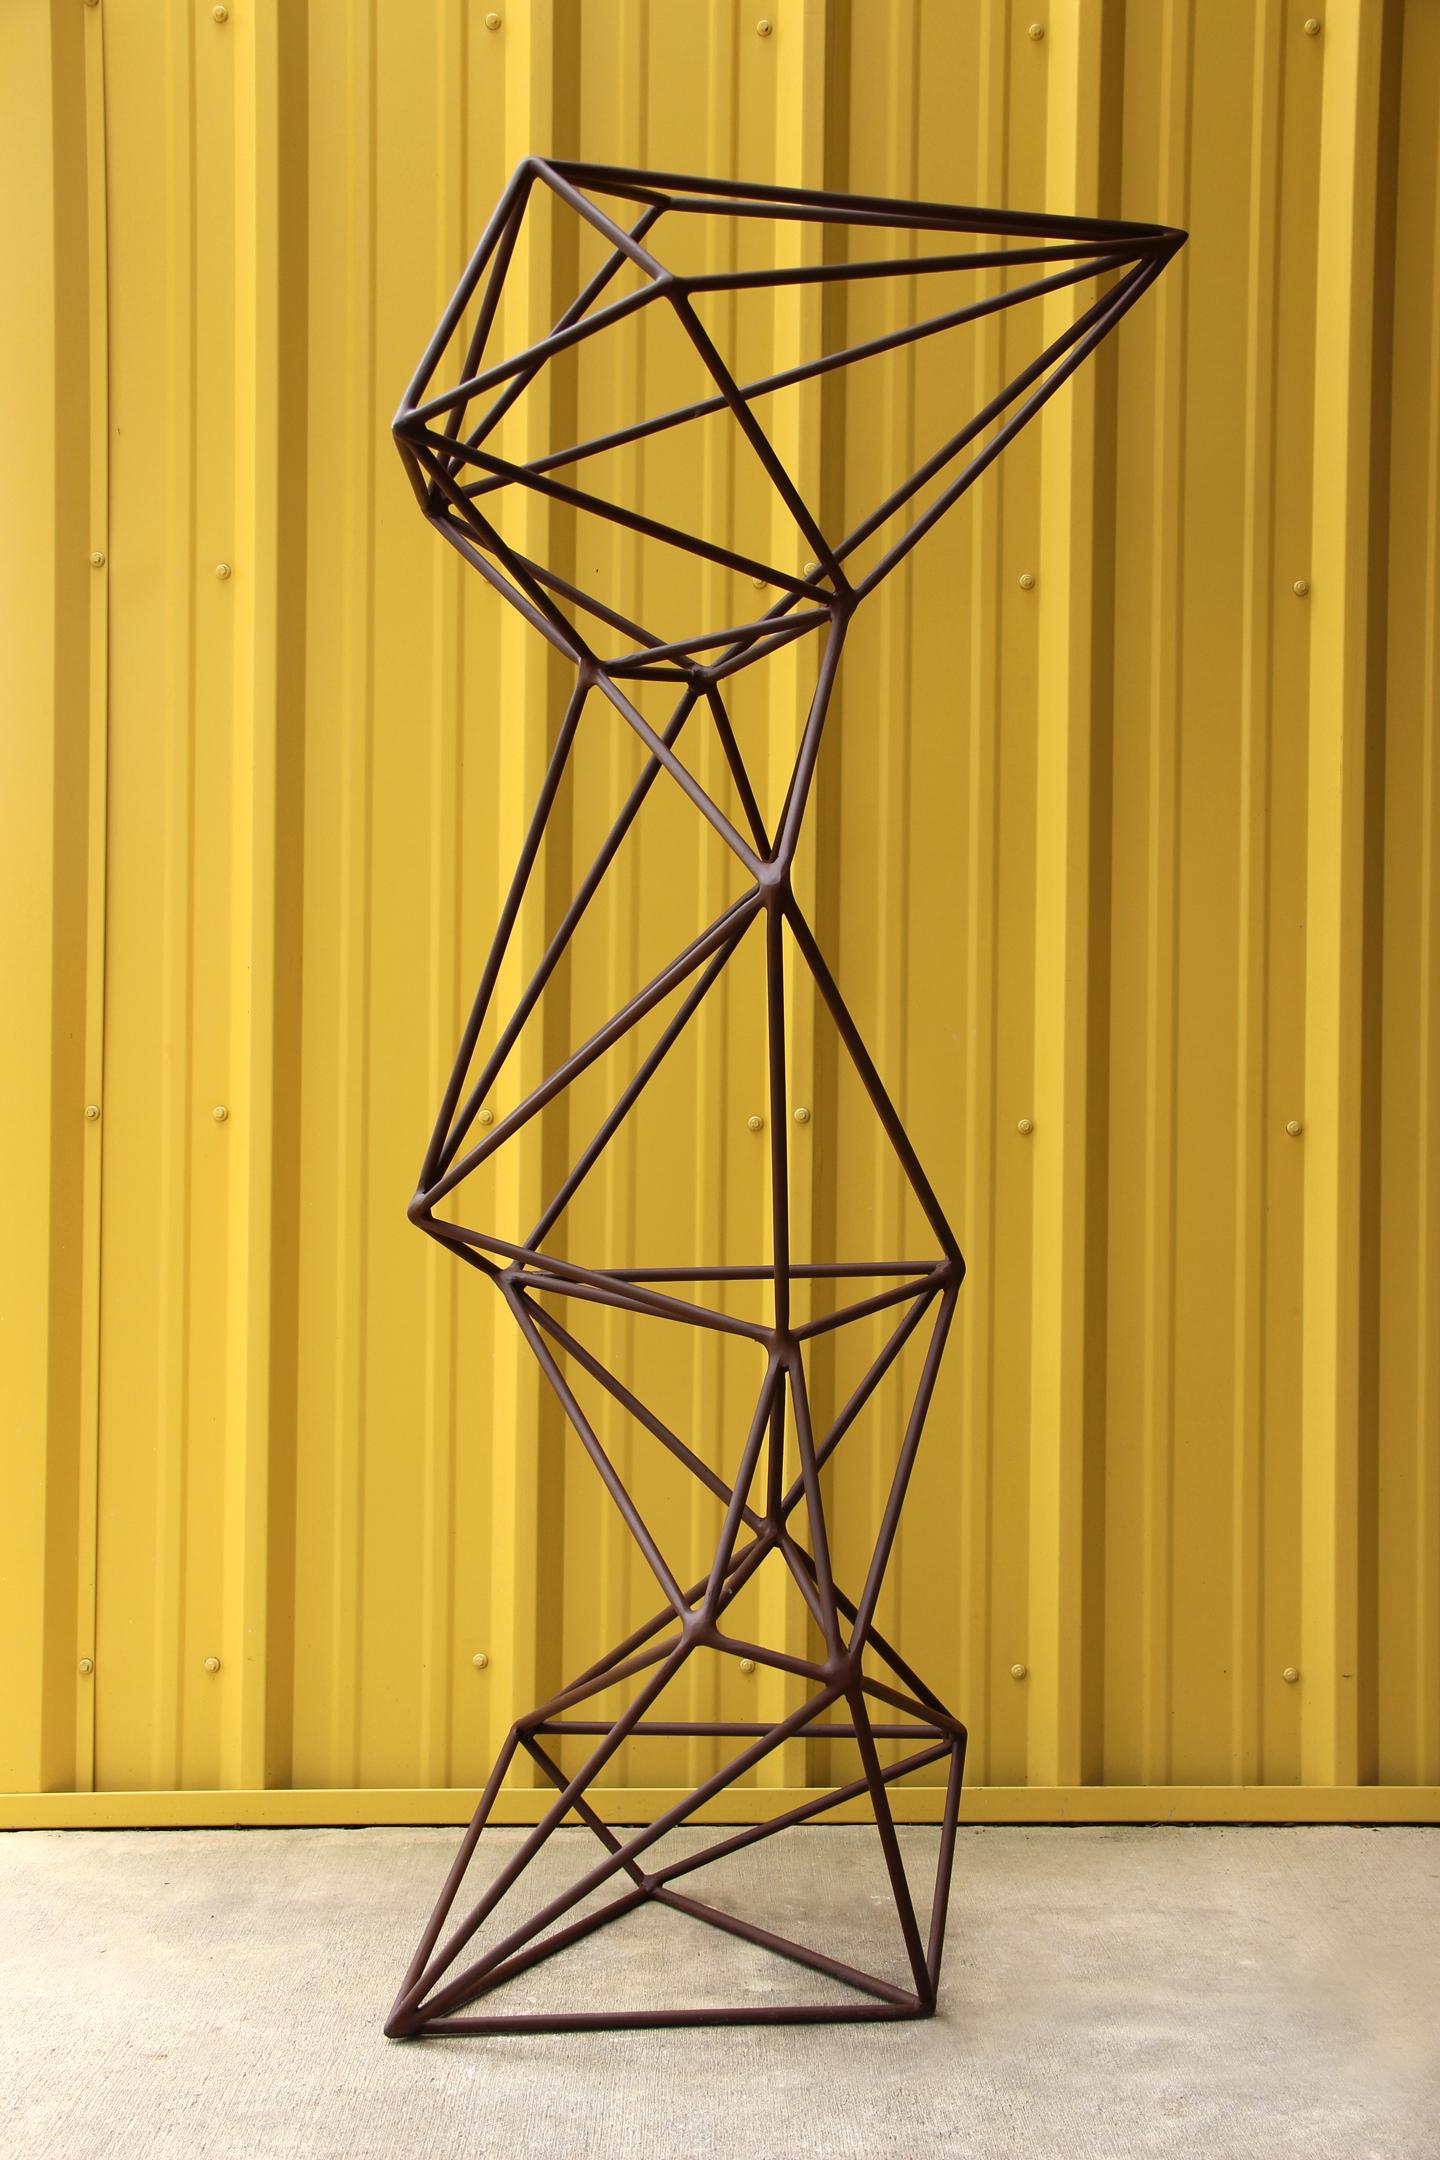 Skeletal Polyhedron #10